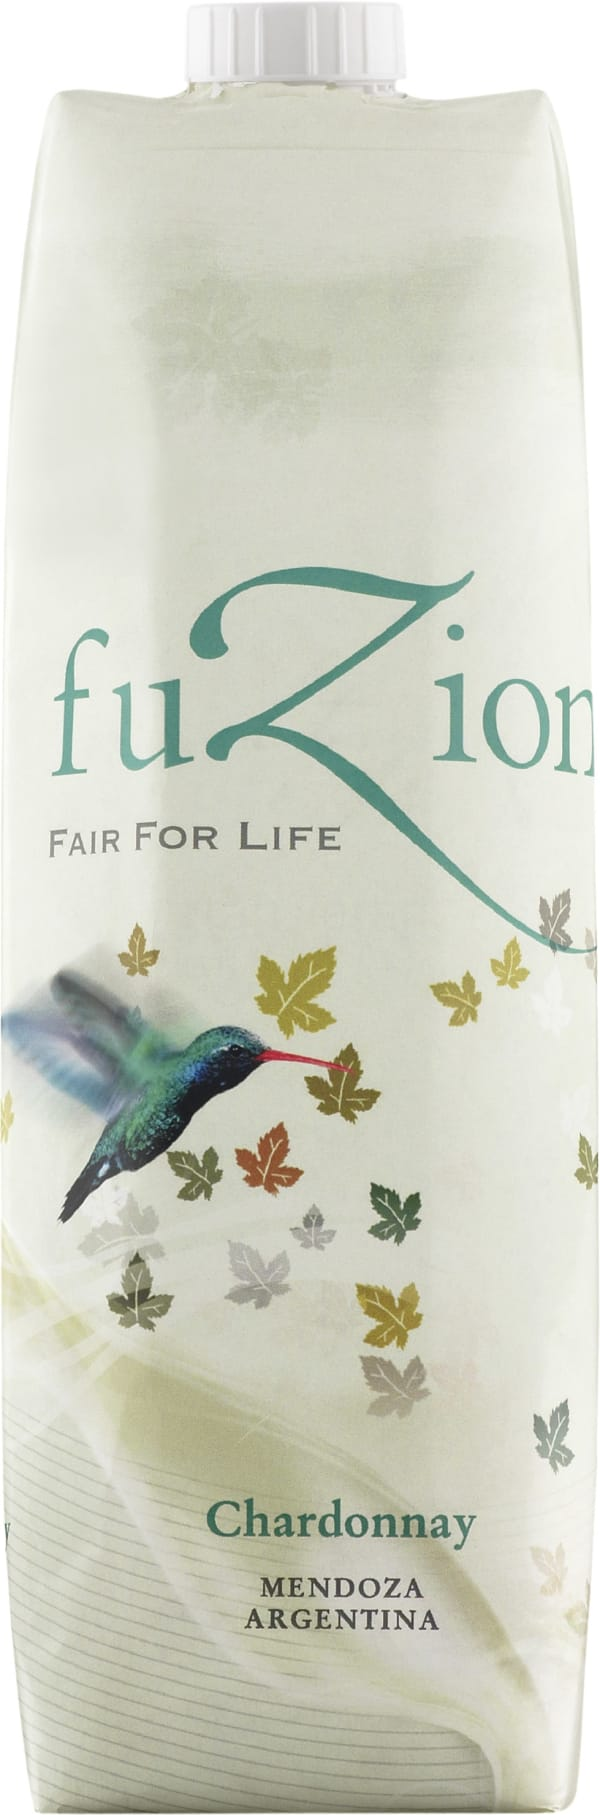 Fuzion Chardonnay 2016 carton package